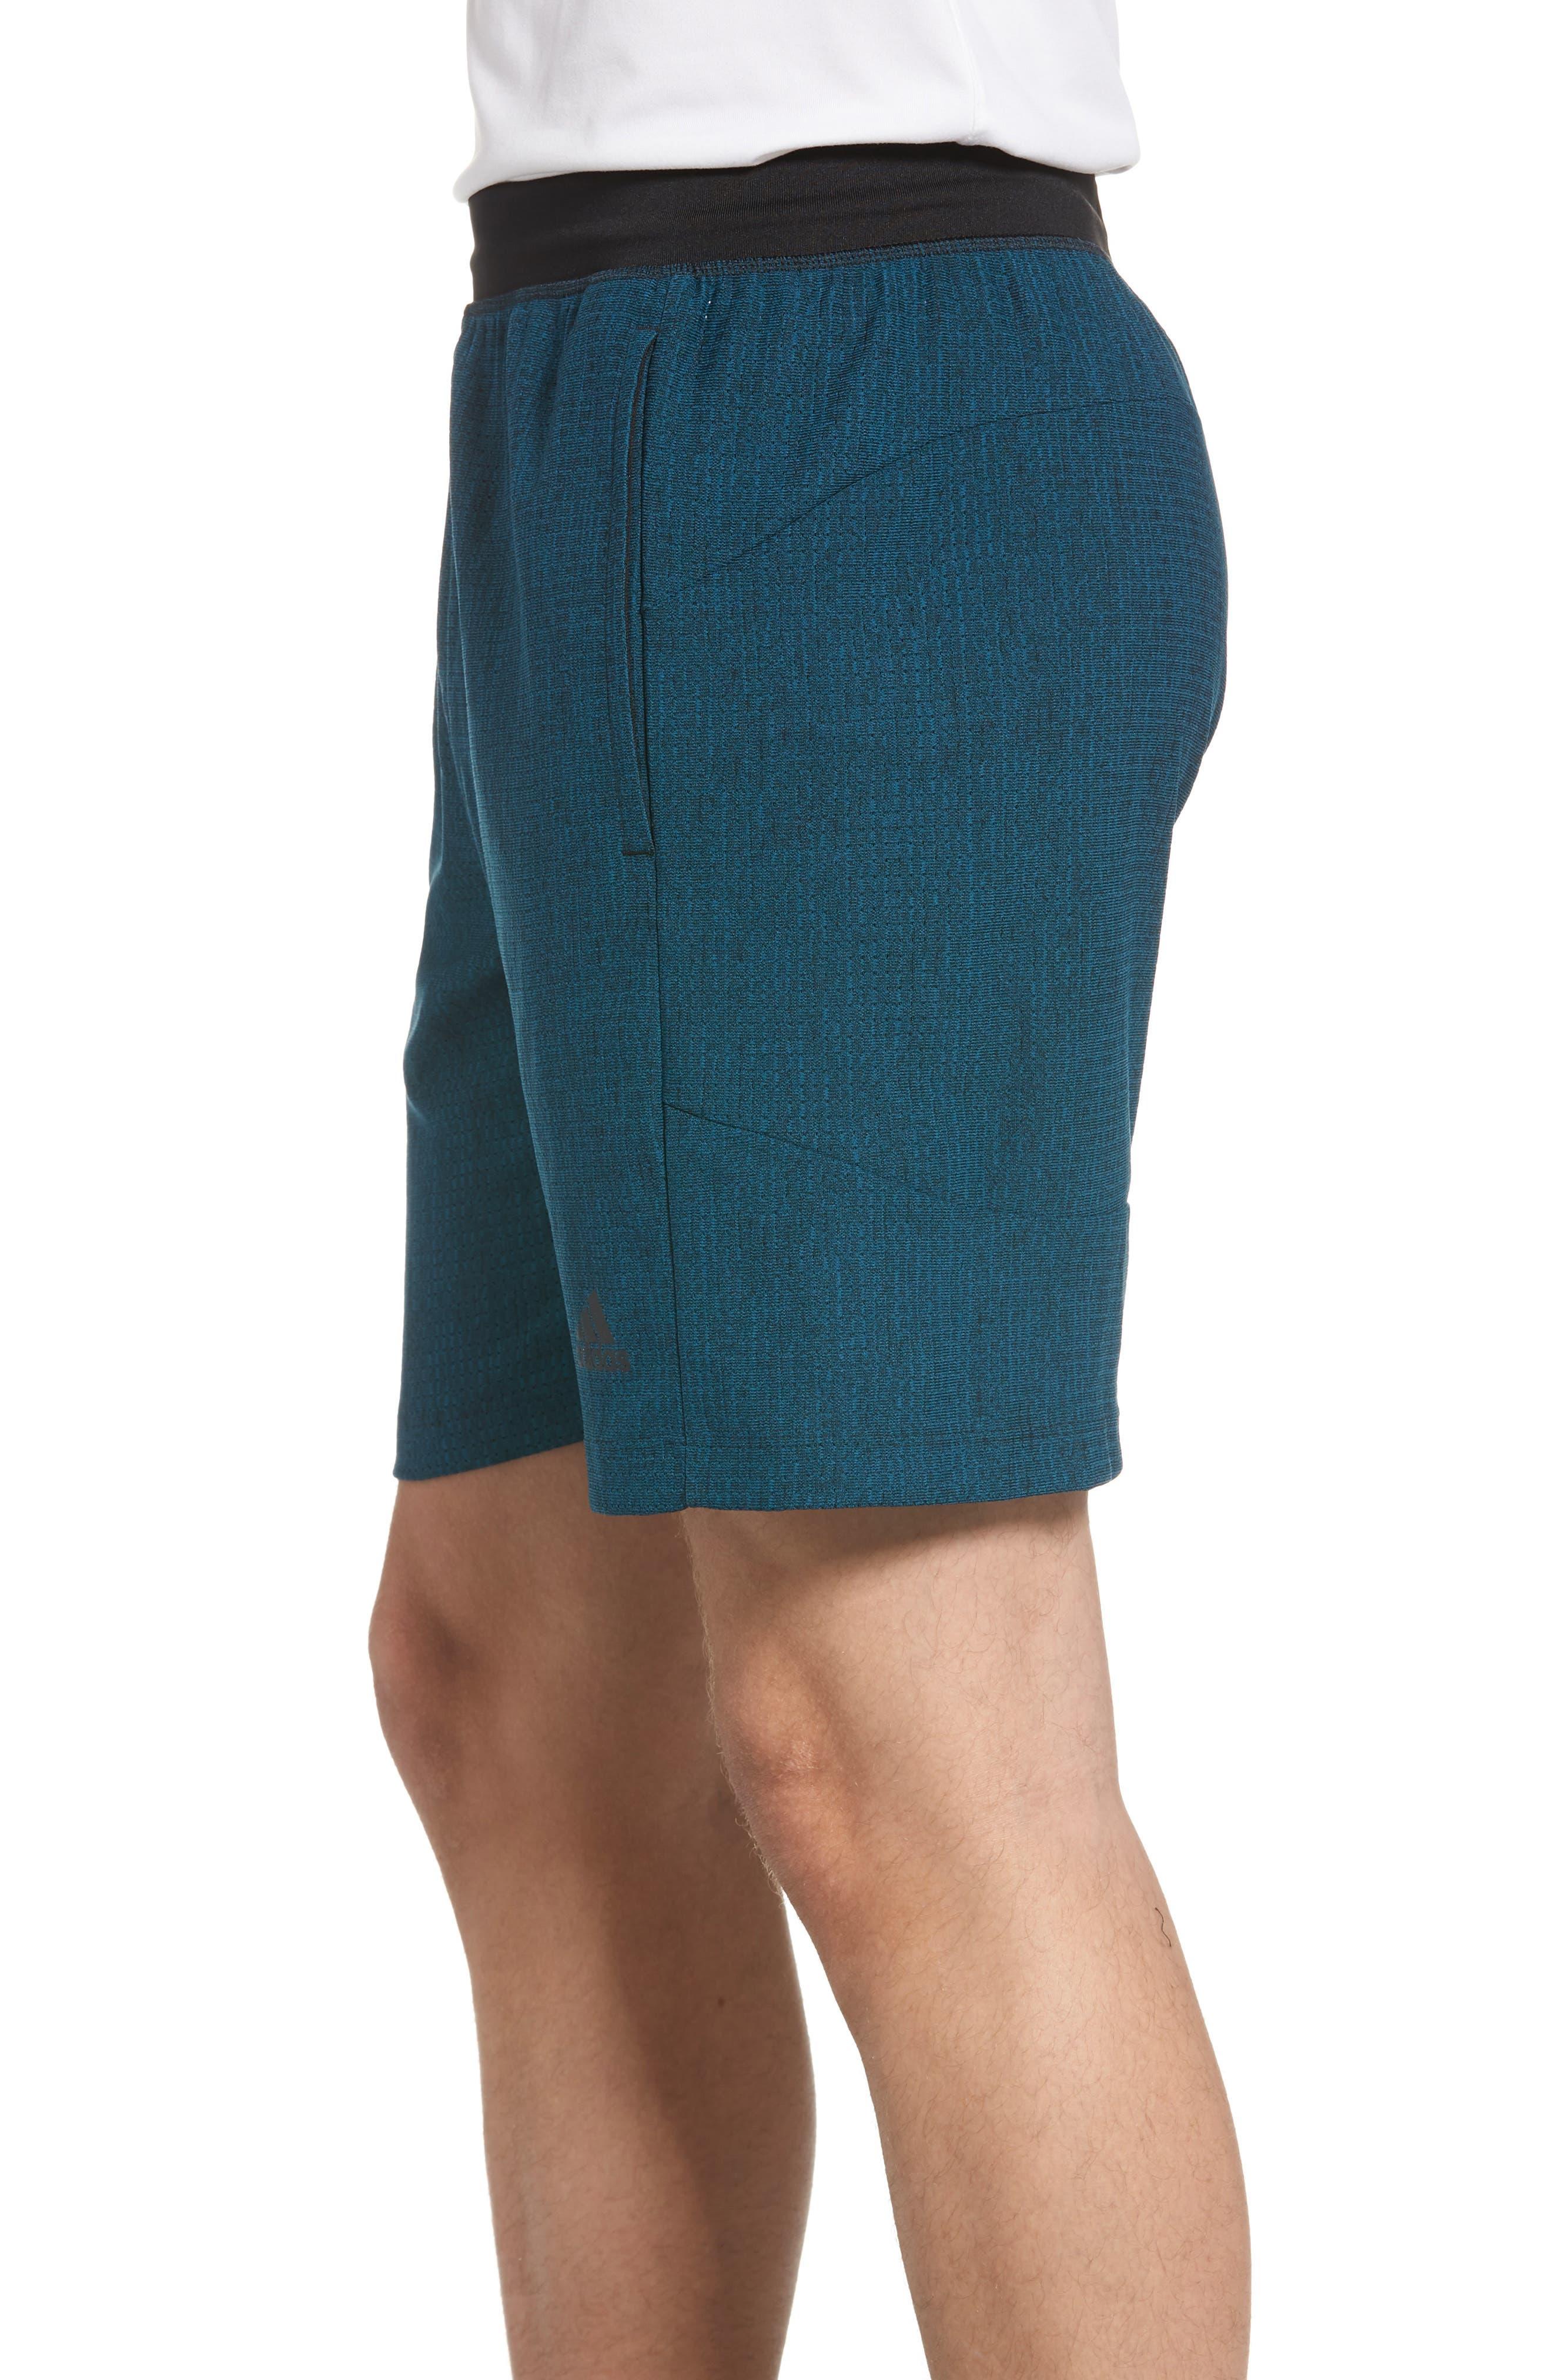 Speedbreaker Shorts,                             Alternate thumbnail 3, color,                             Real Teal